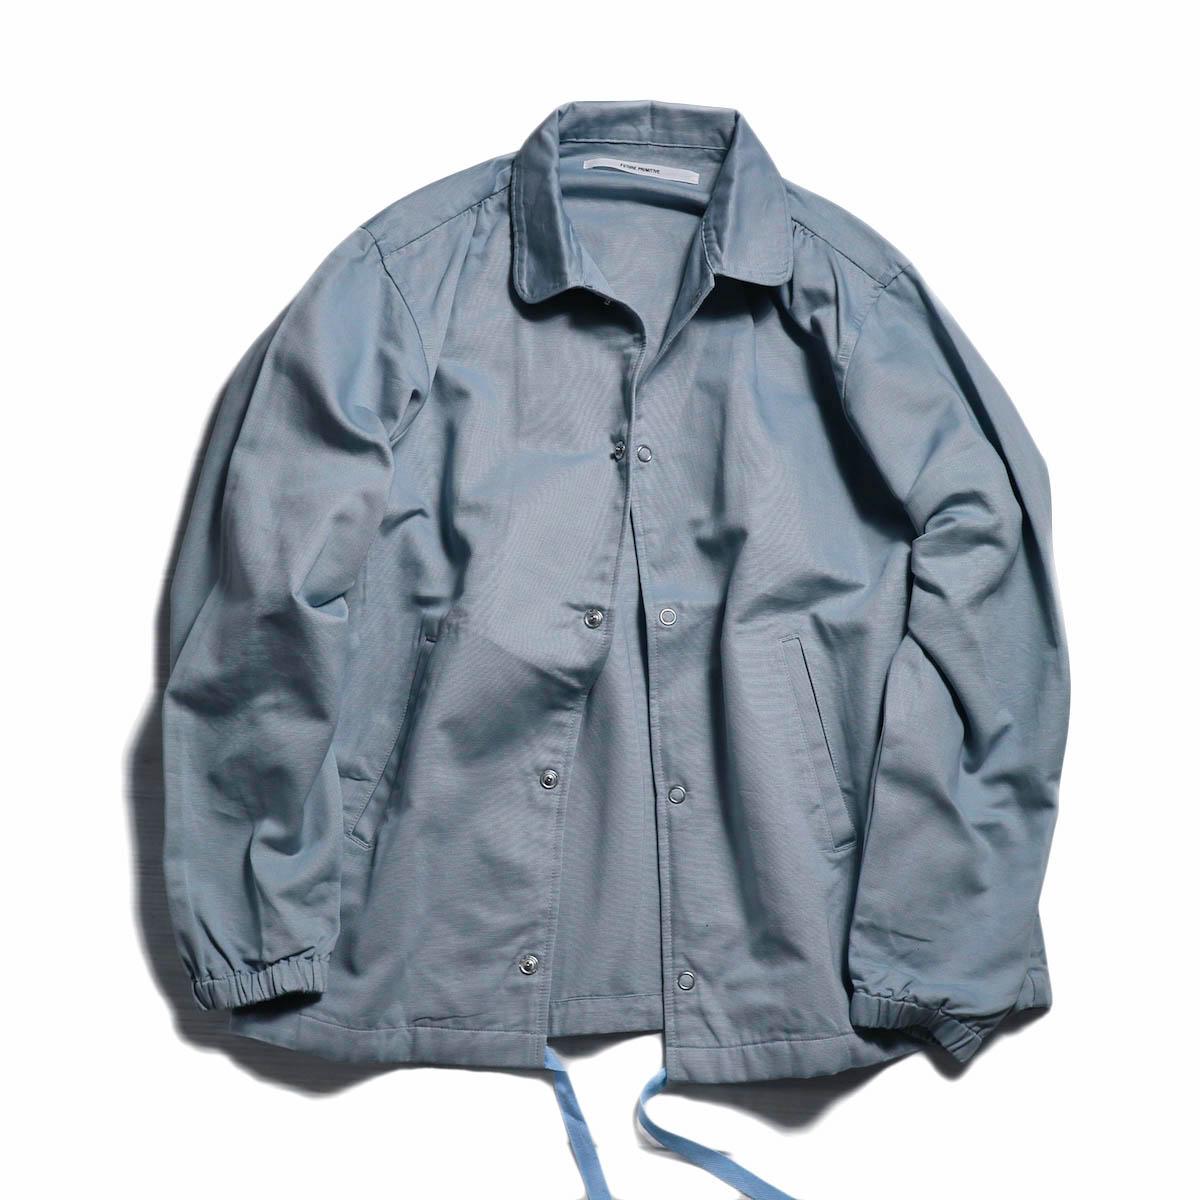 FUTURE PRIMITIVE / FP COACH JKT -LT.BLUE